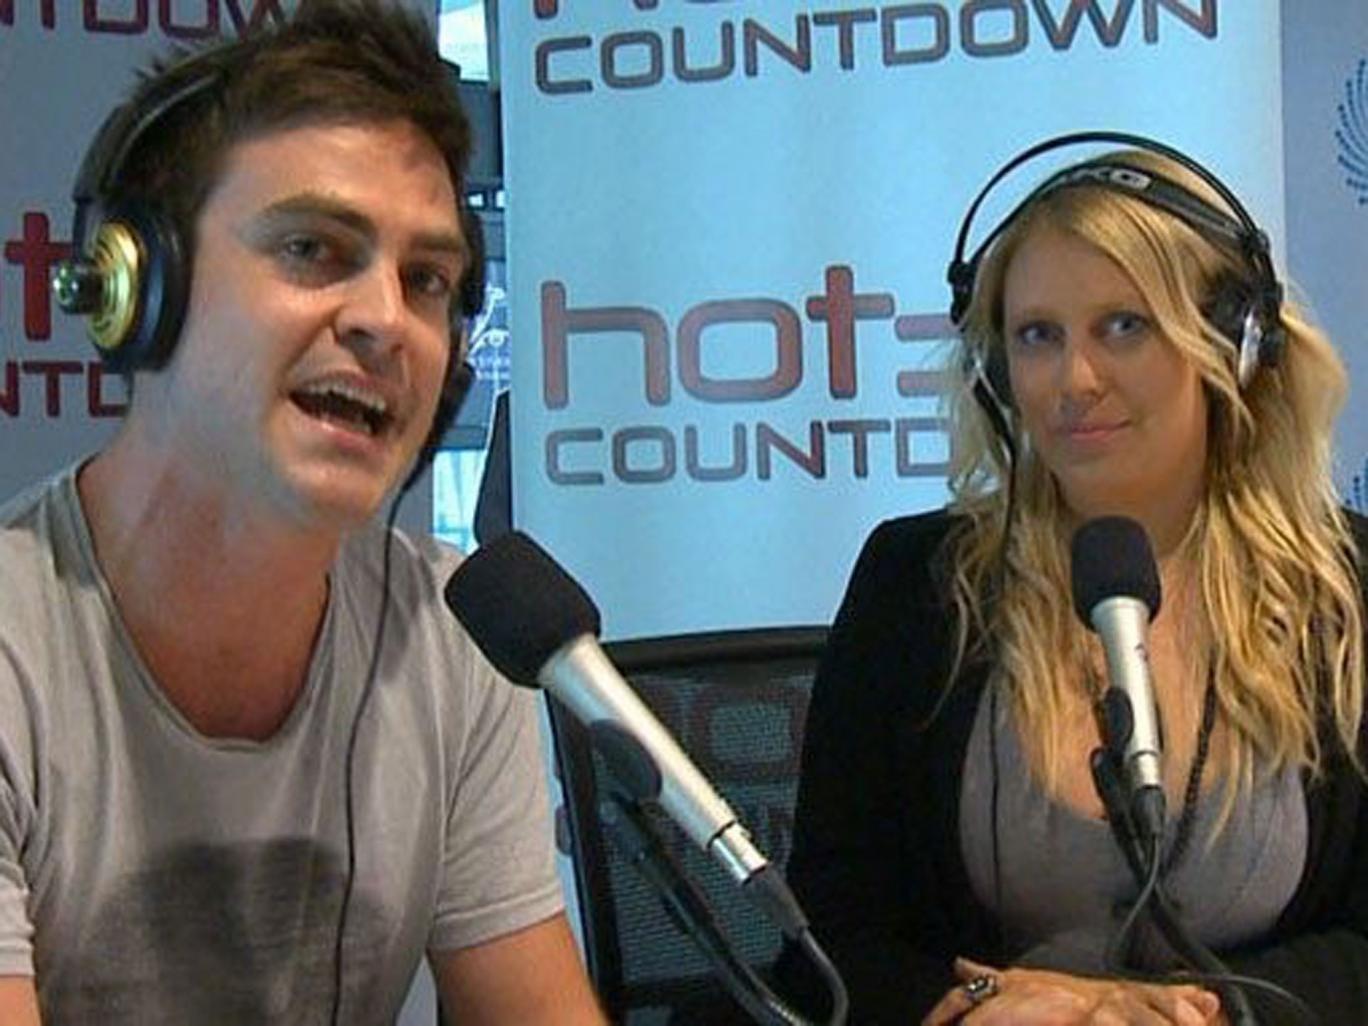 Australian DJs Michael Christian and Mel Greig of 2Day FM radio